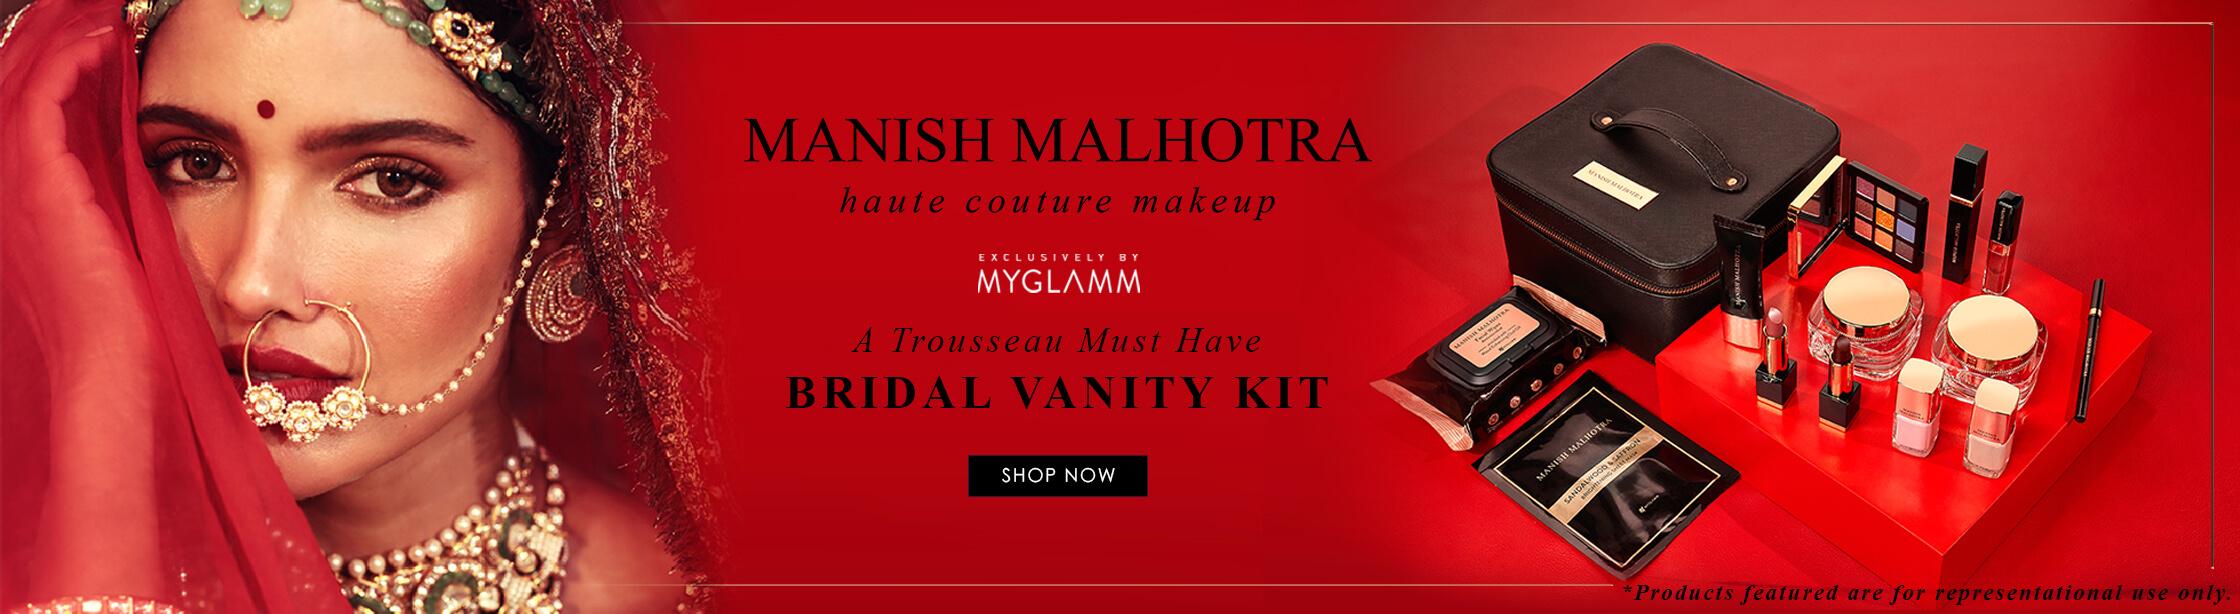 Bridal Vanity Kit Sleek Banner